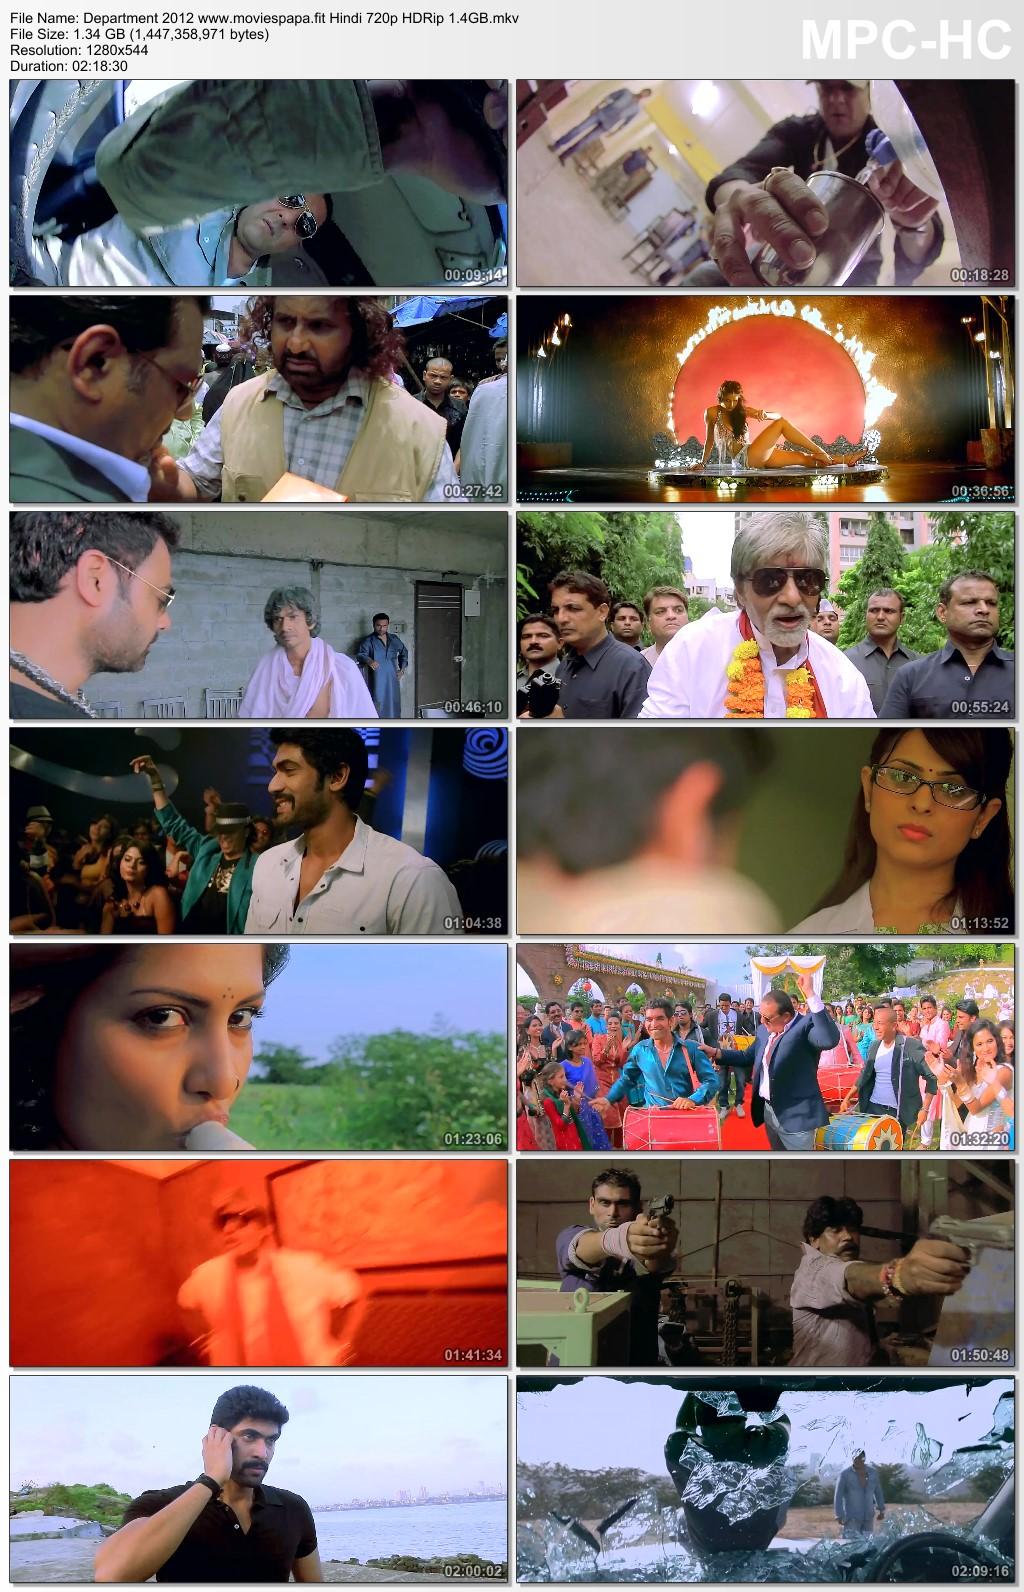 Department 2012 Hindi Movie 720p HDRip 1.3GB Download